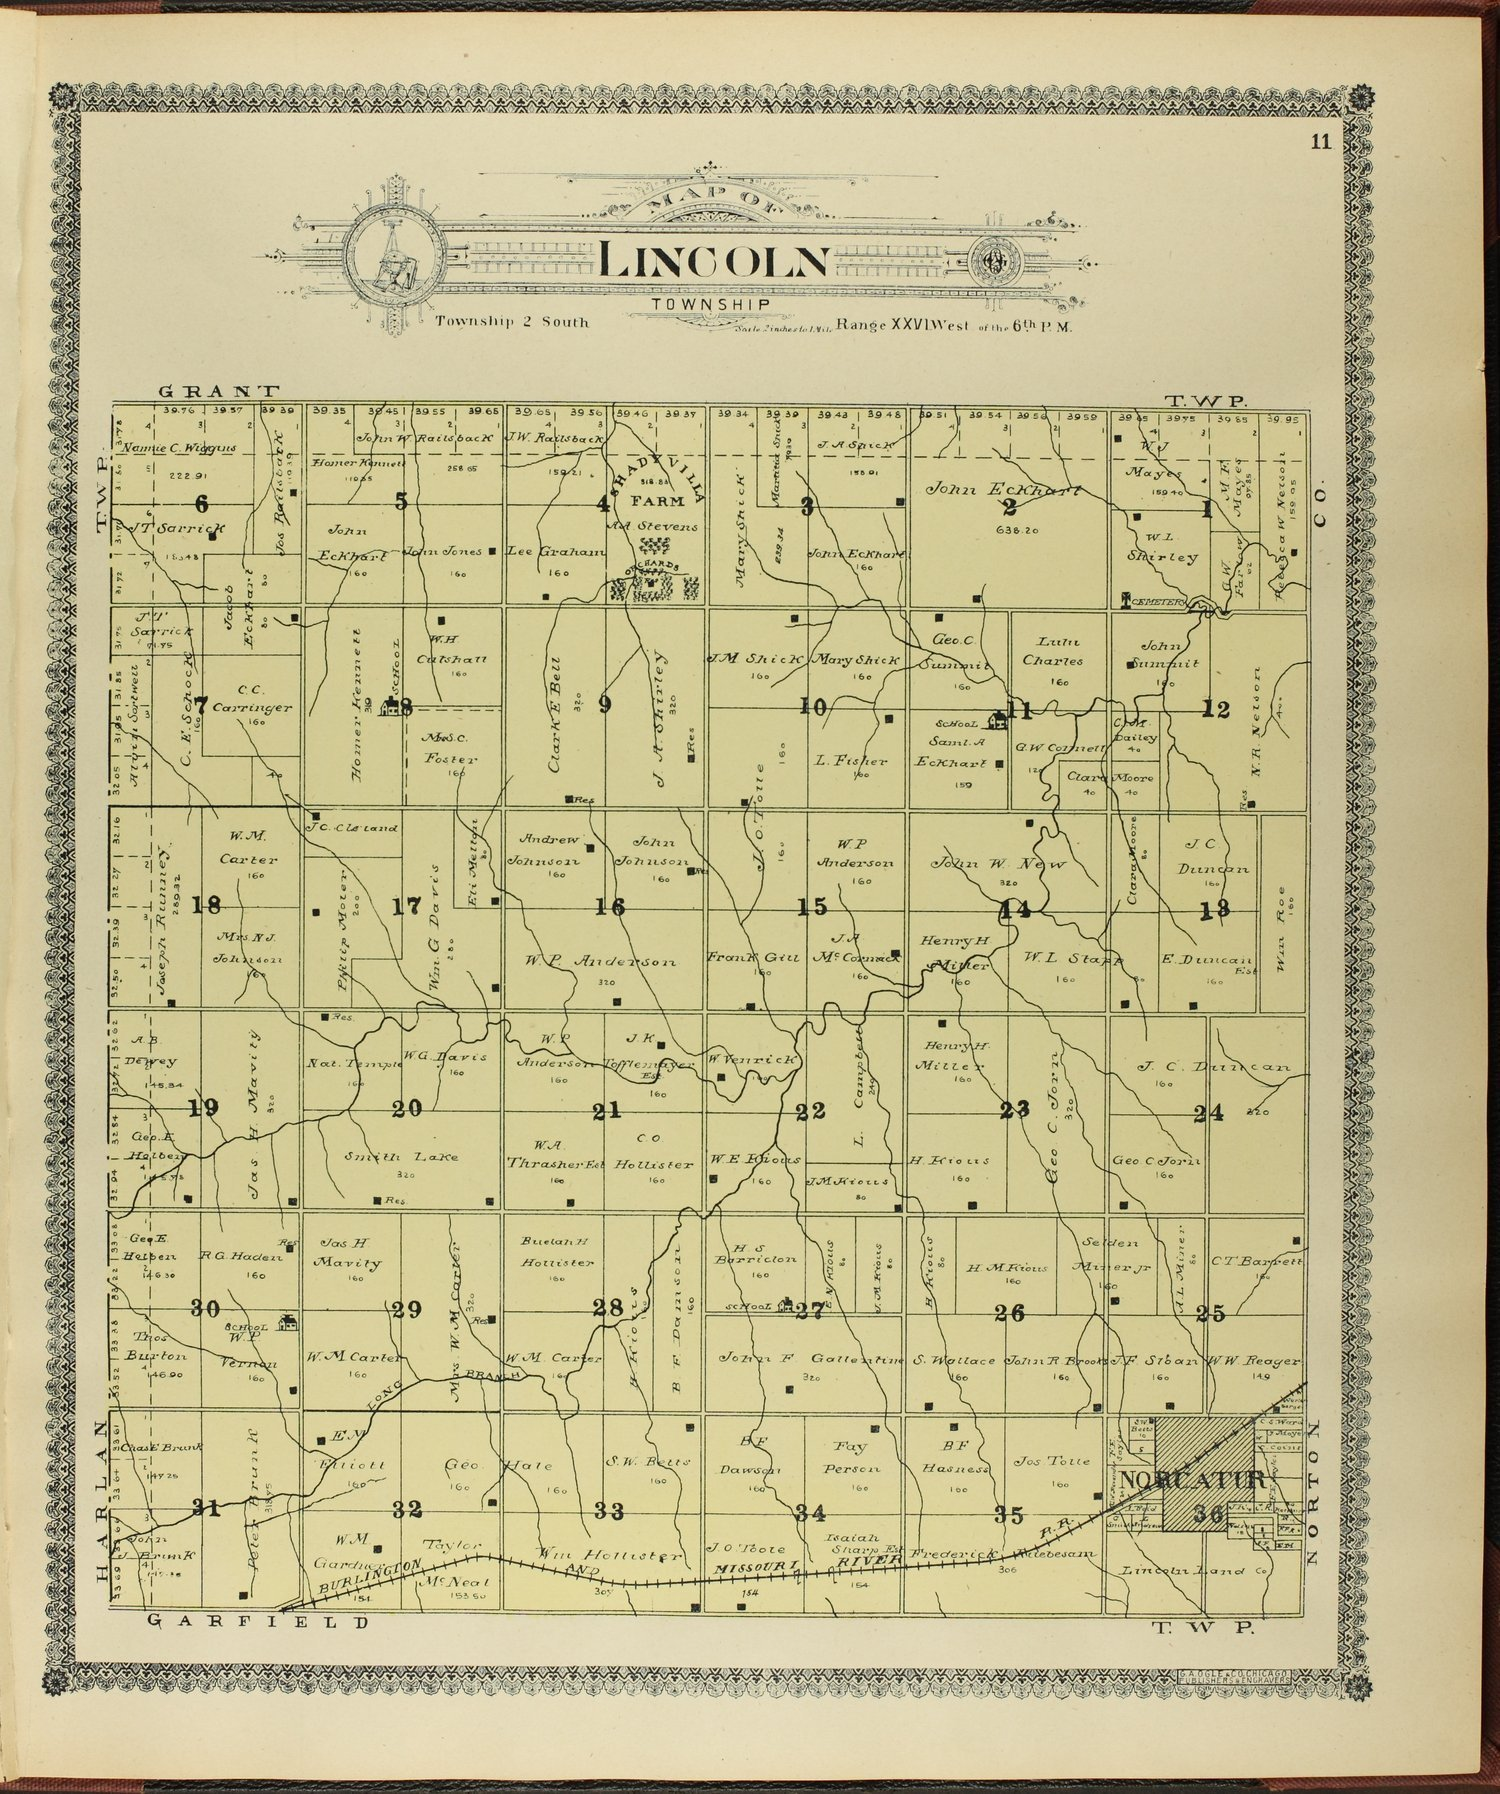 Standard atlas of Decatur County, Kansas - 11